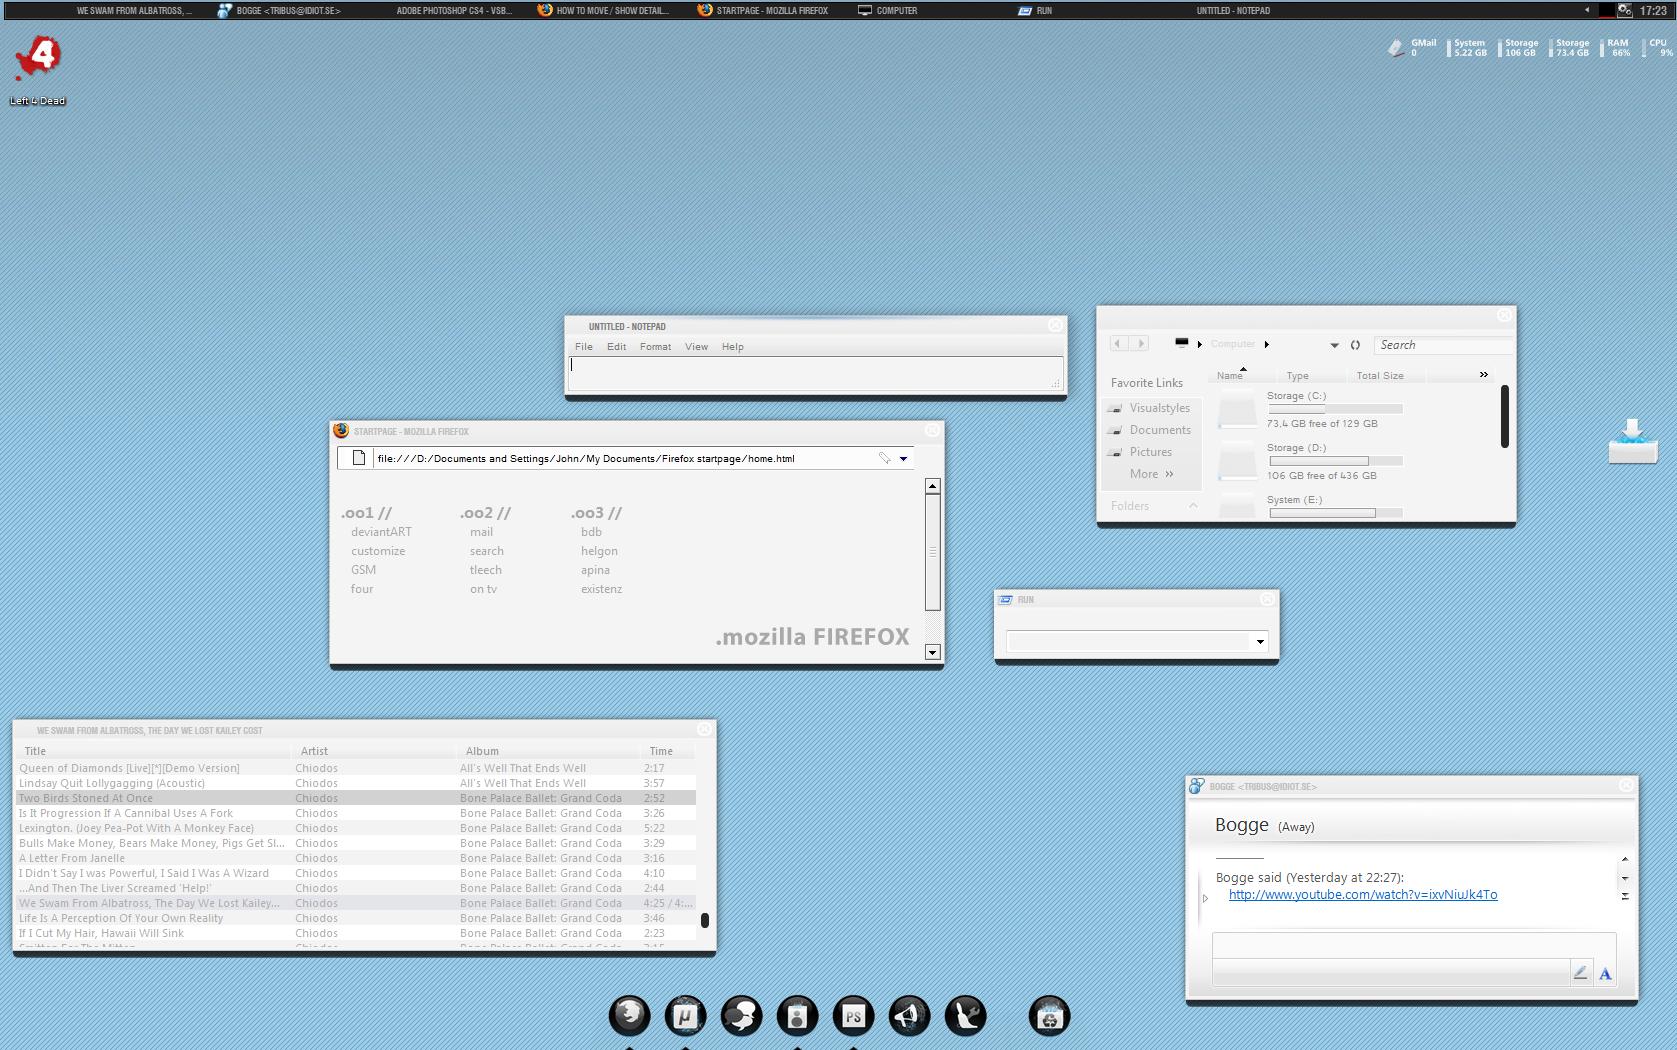 Desktop 27-12-08 by invaderjohn